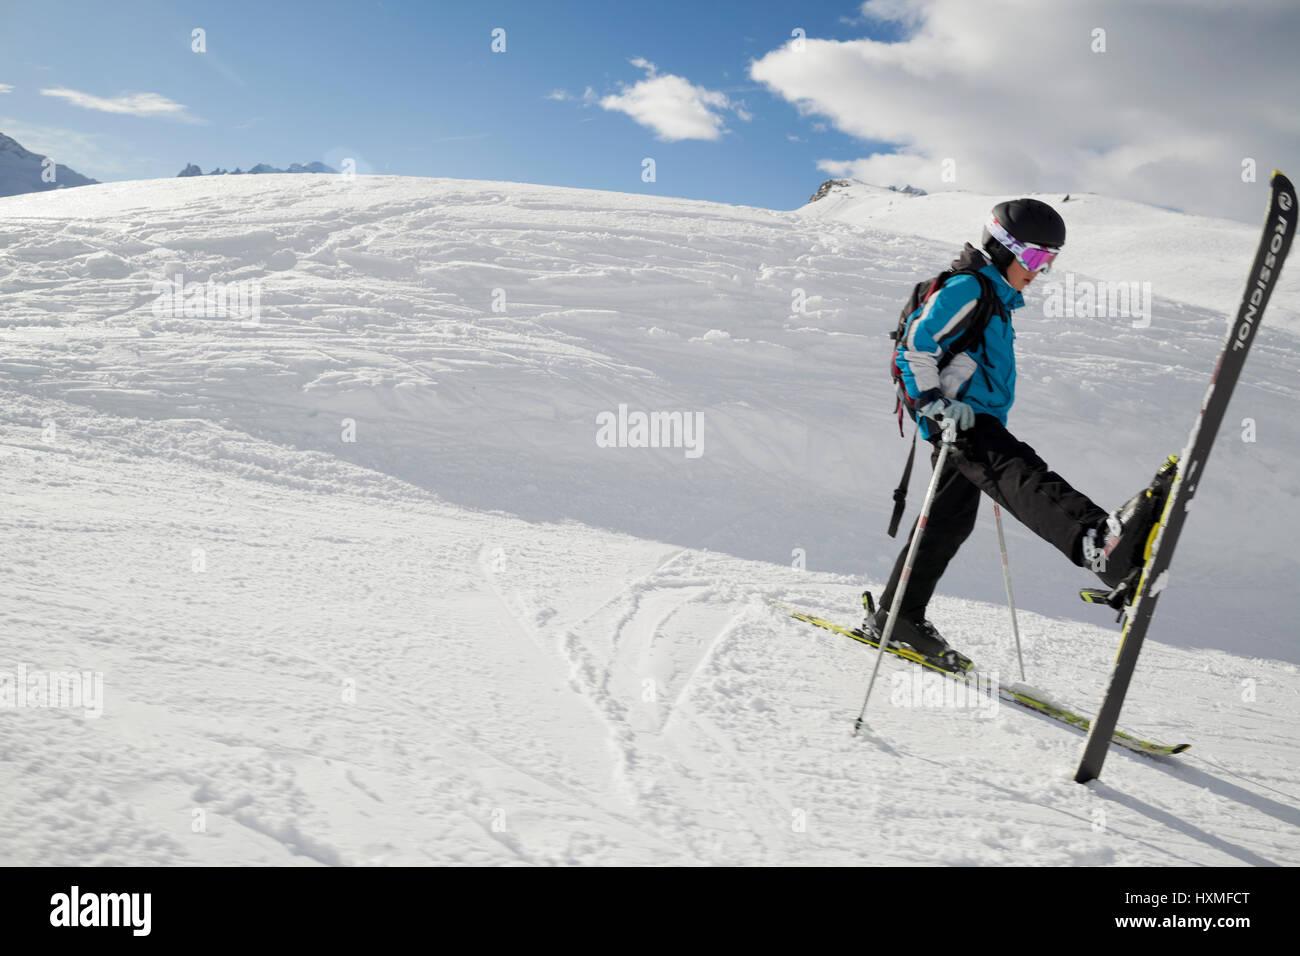 Un esquiador se extiende sobre la ladera de una pista en la Domaine de Balme ski resort en el Tour fuera de Chamonix Foto de stock